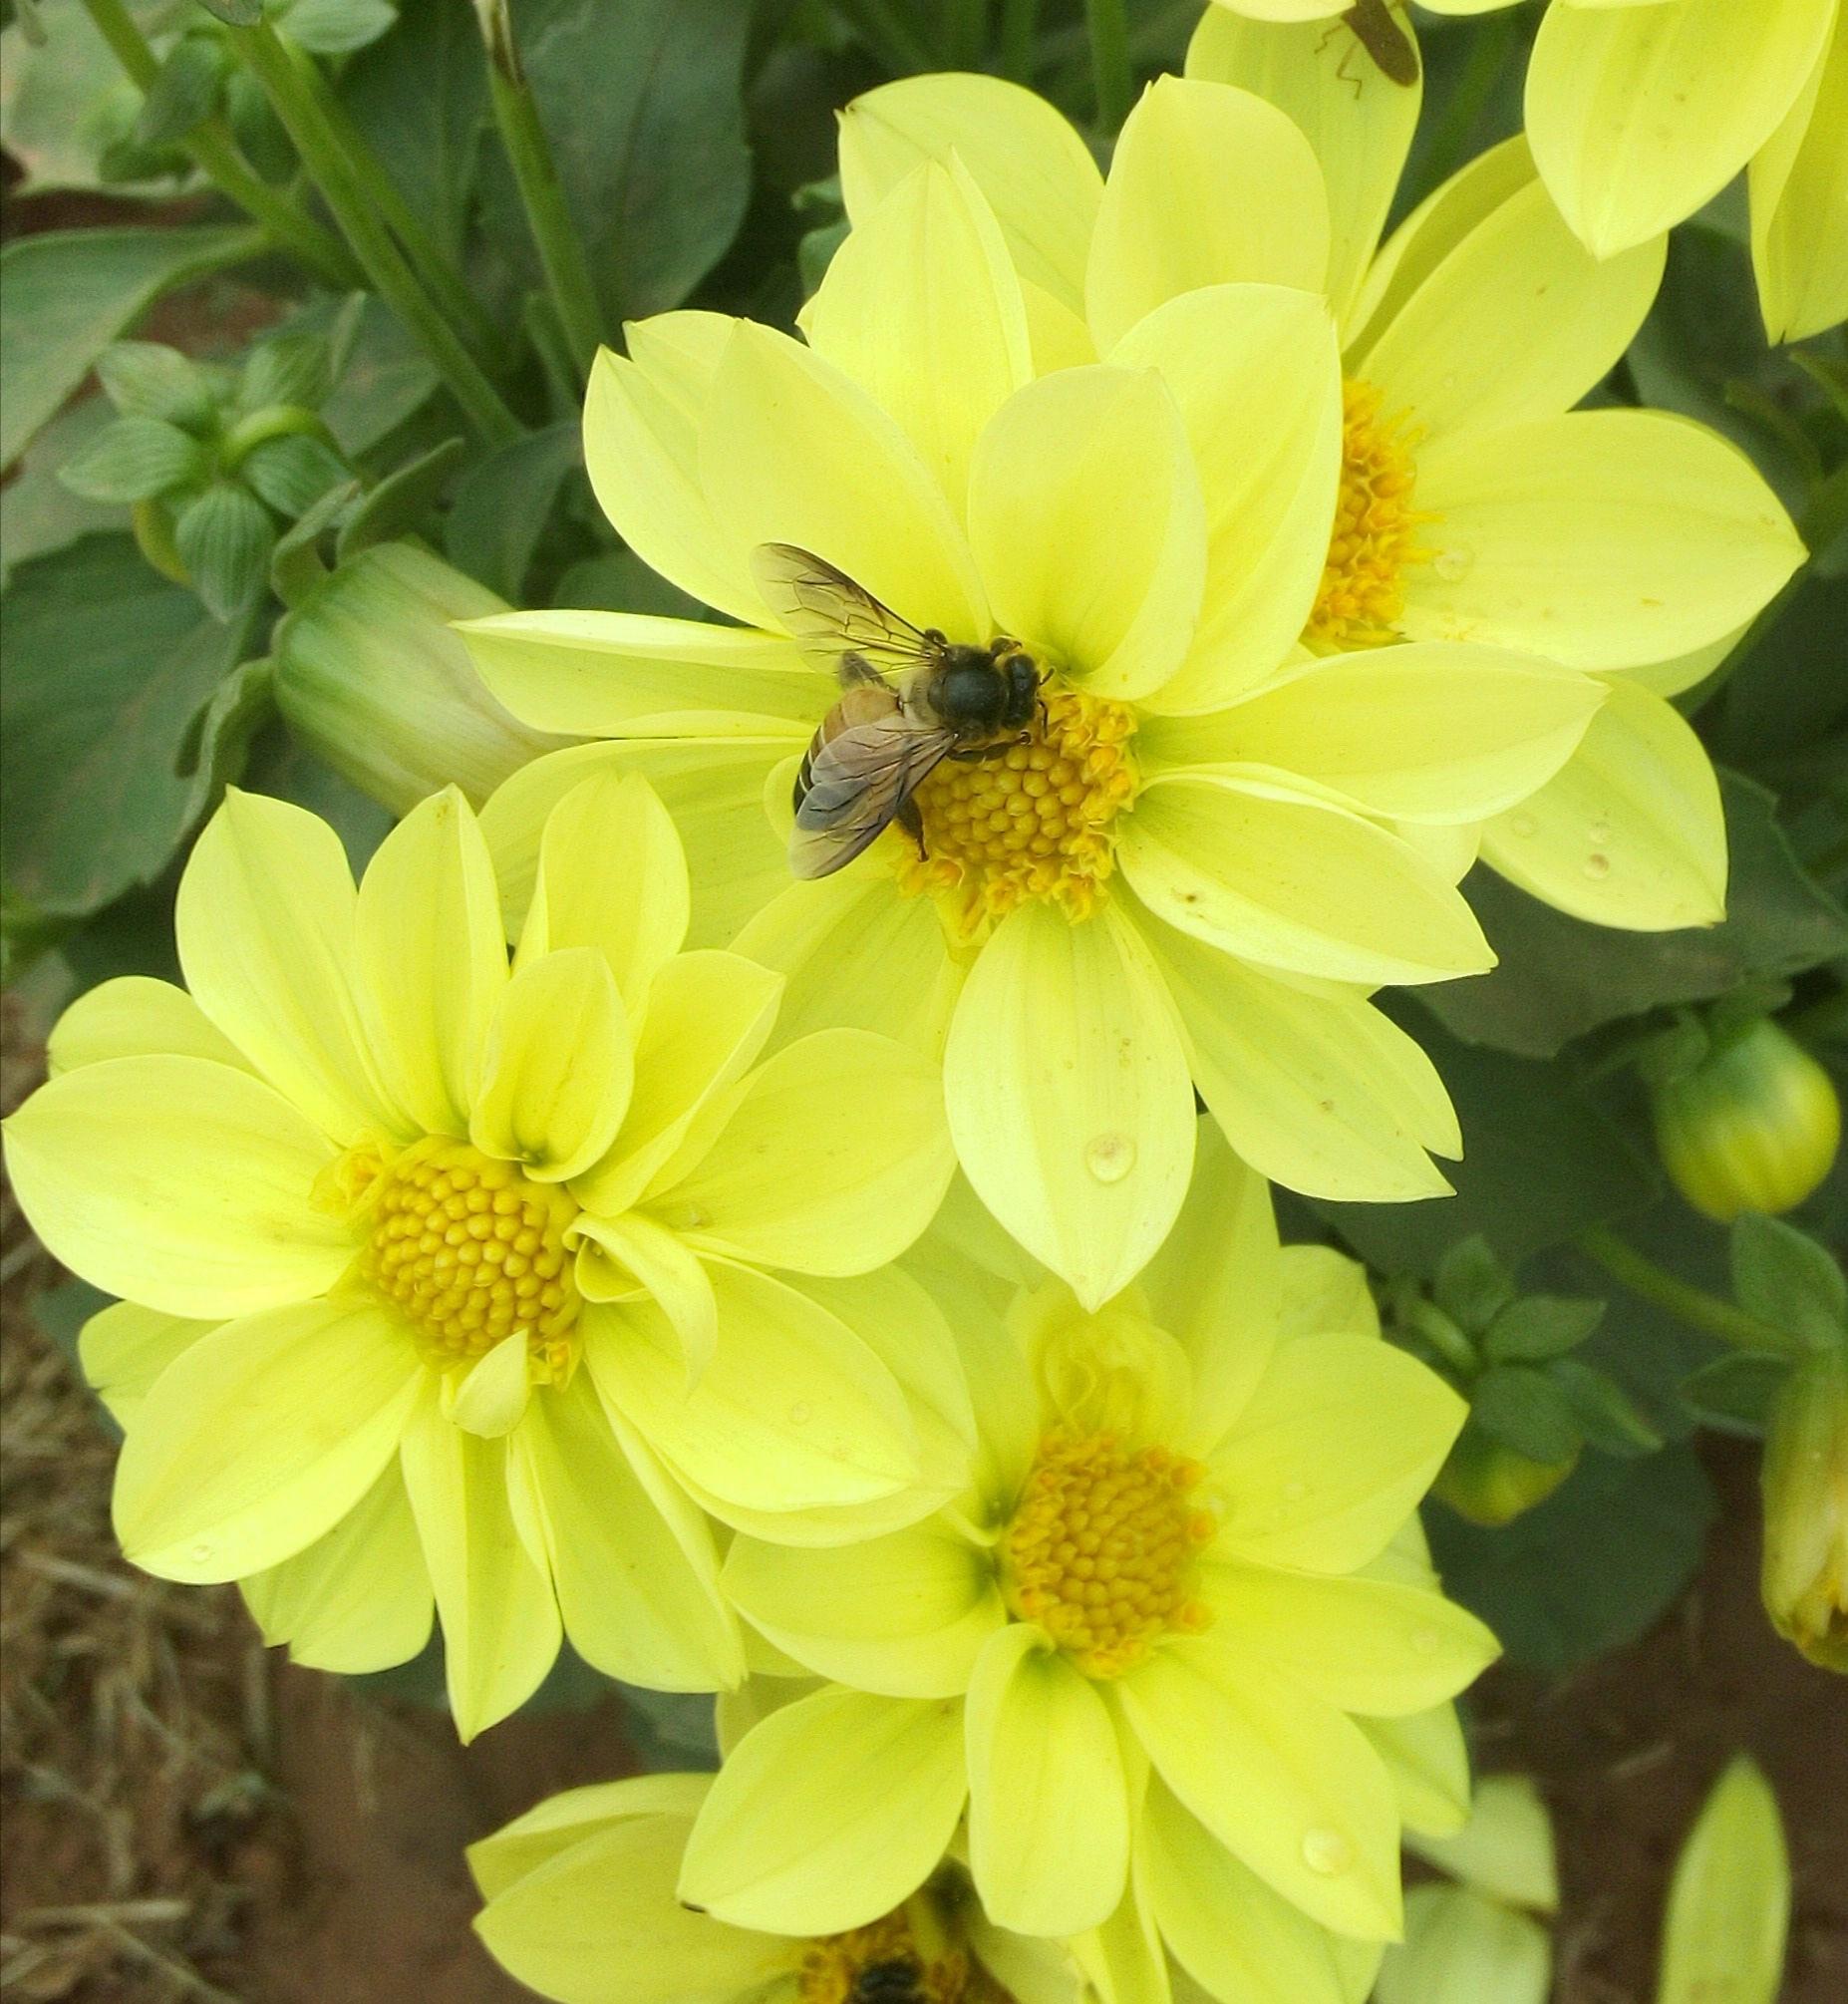 A honeybee on yellow flowers